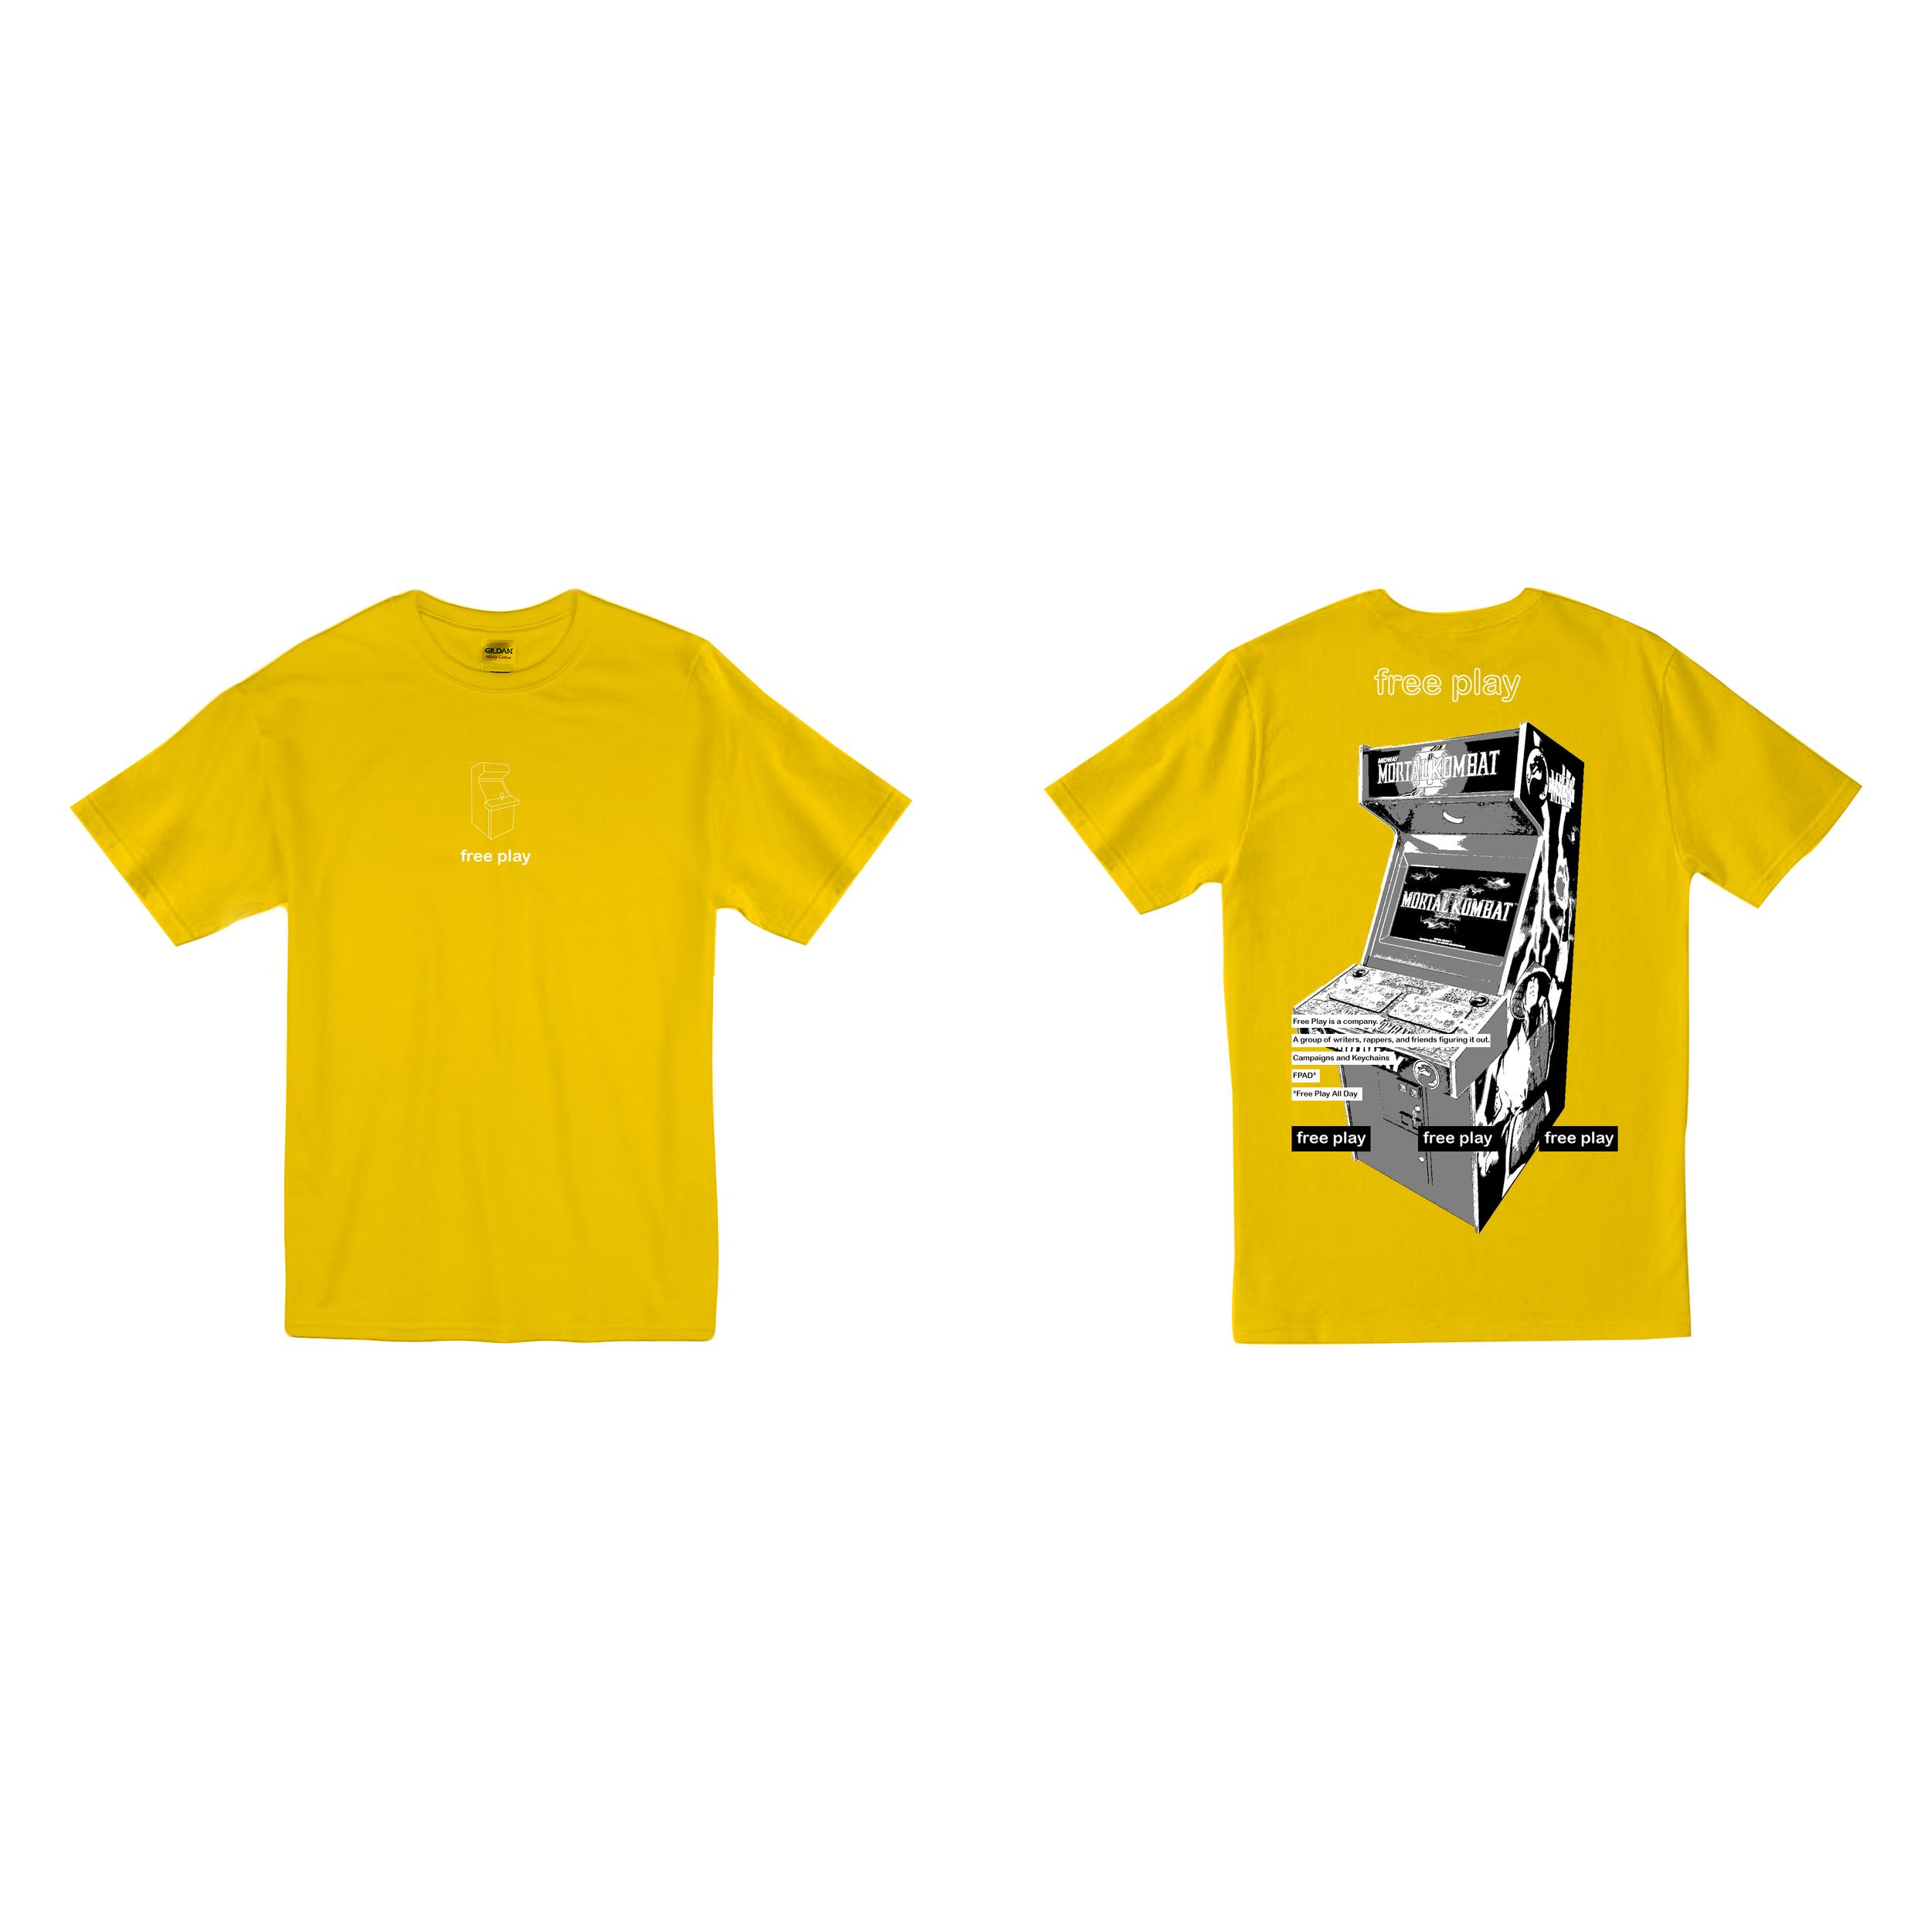 shirt 6.png